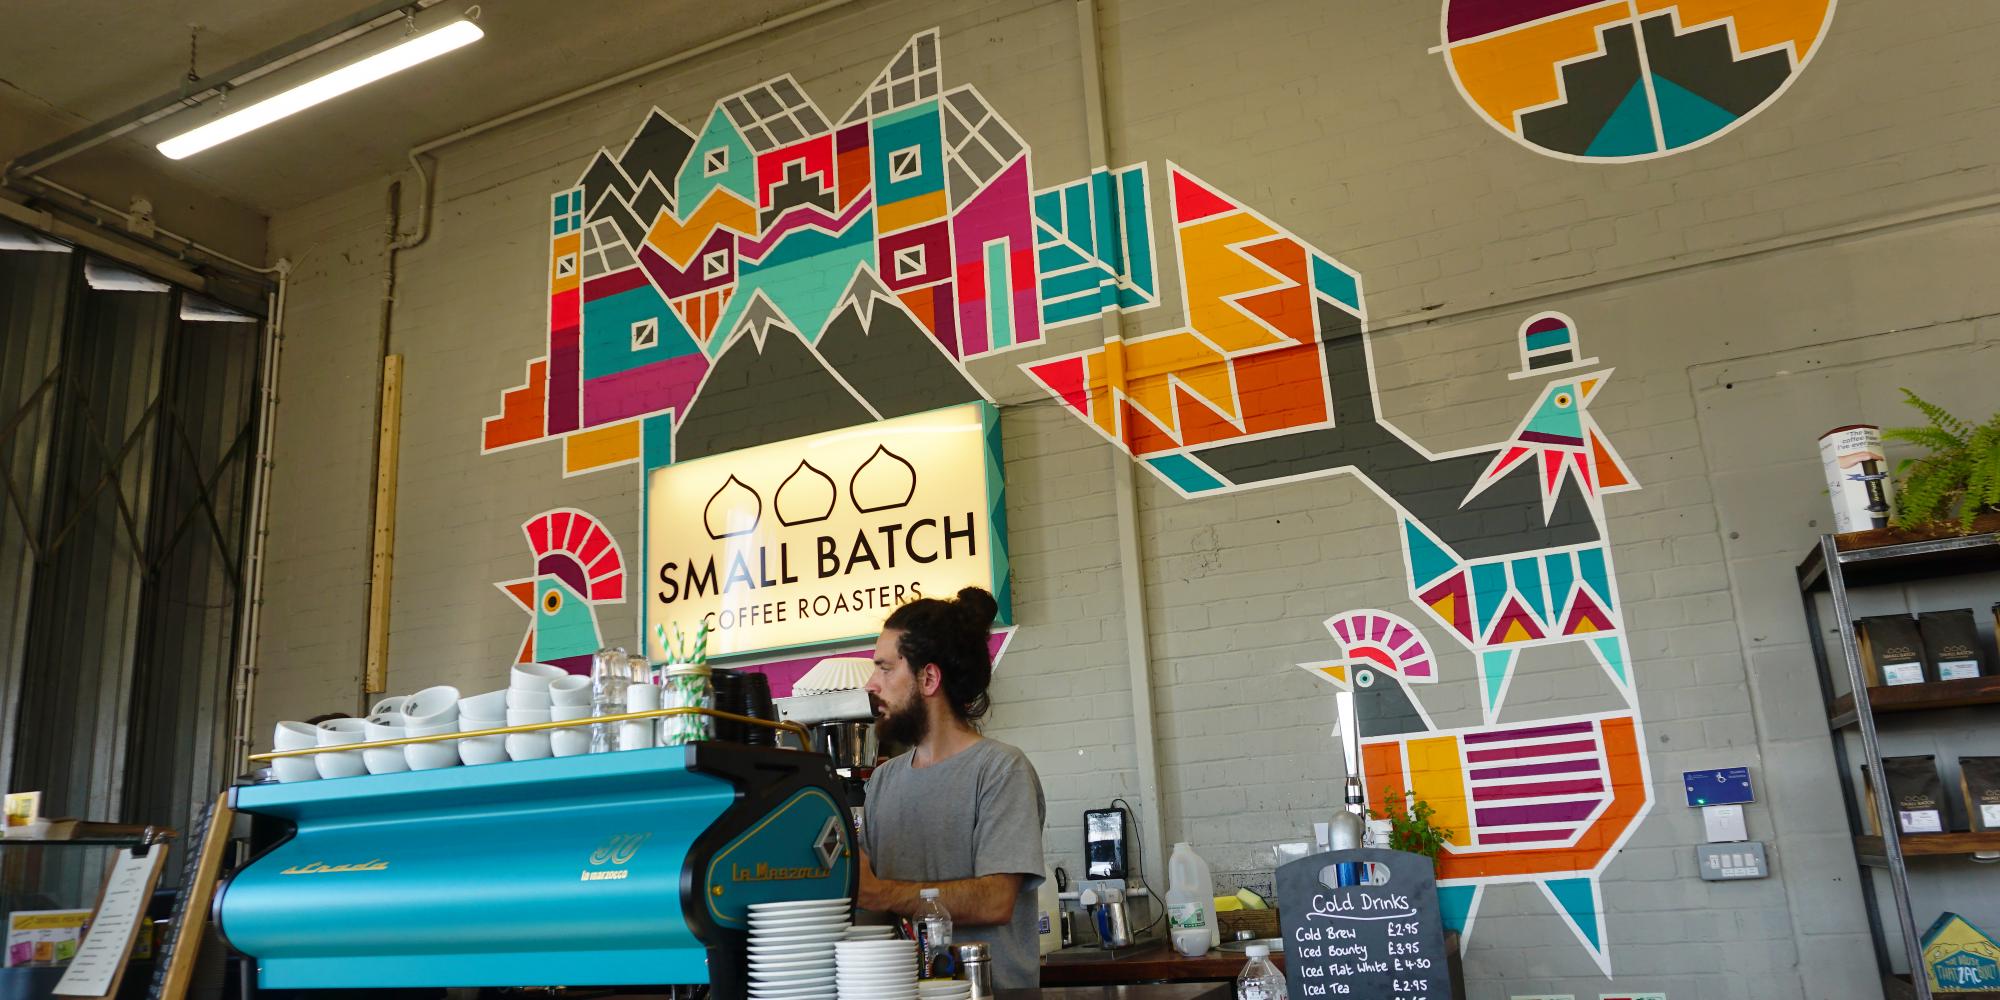 Small Batch Coffee (Wellington House)